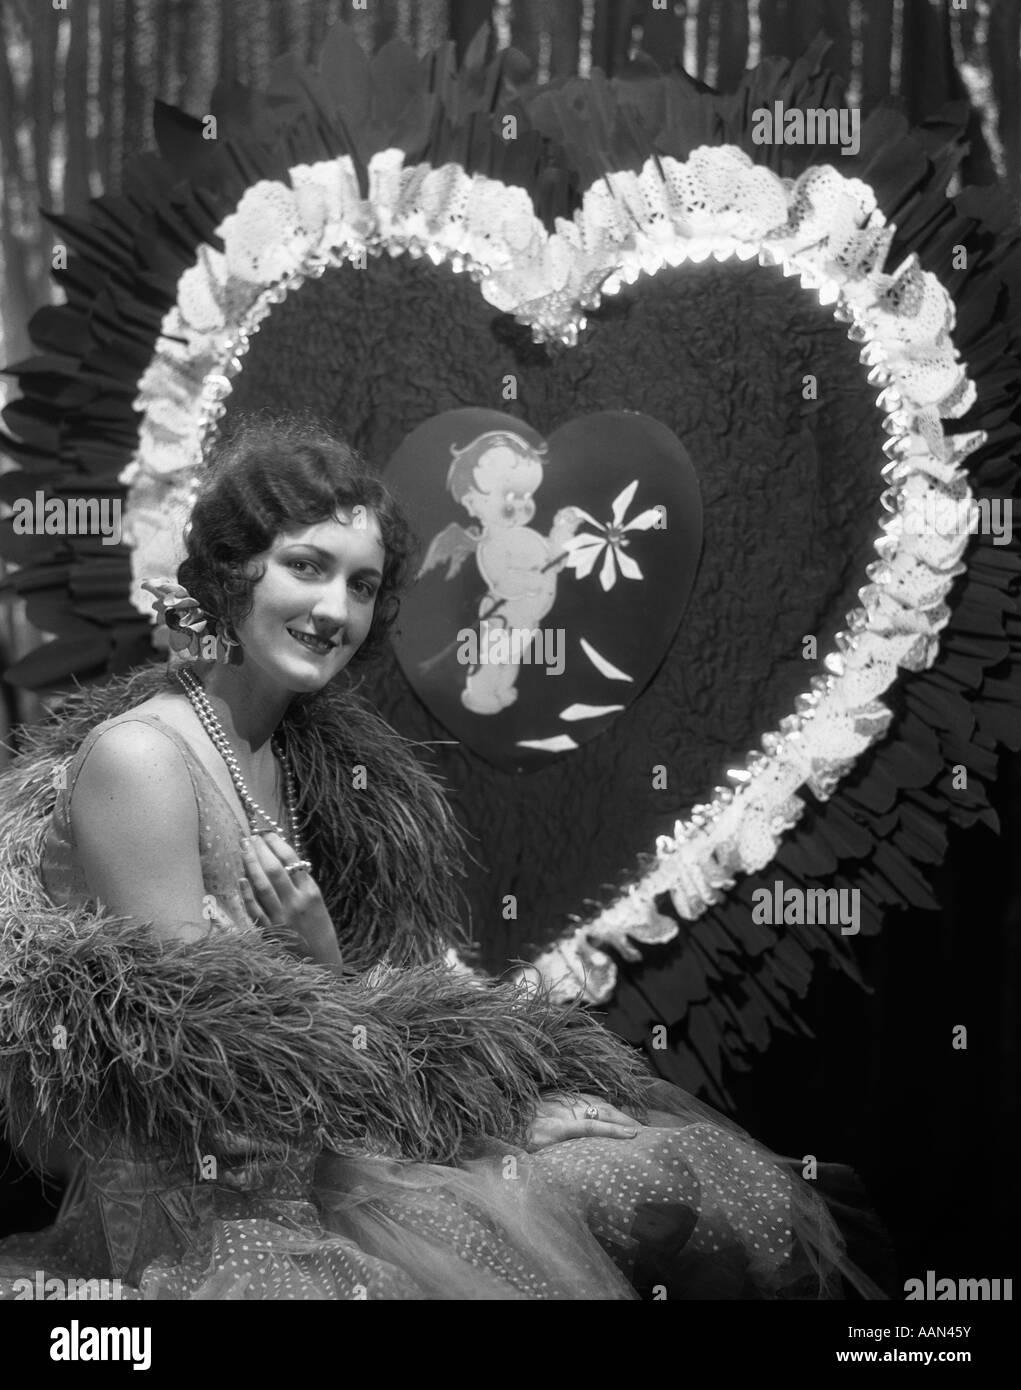 1920S 1930S LÄCHELNDE JUNGE FRAU KAMERA FINGER WAVE HAAR PERLEN FEDERBOA RIESEN VALENTINE HERZEN BETRACHTEN Stockbild